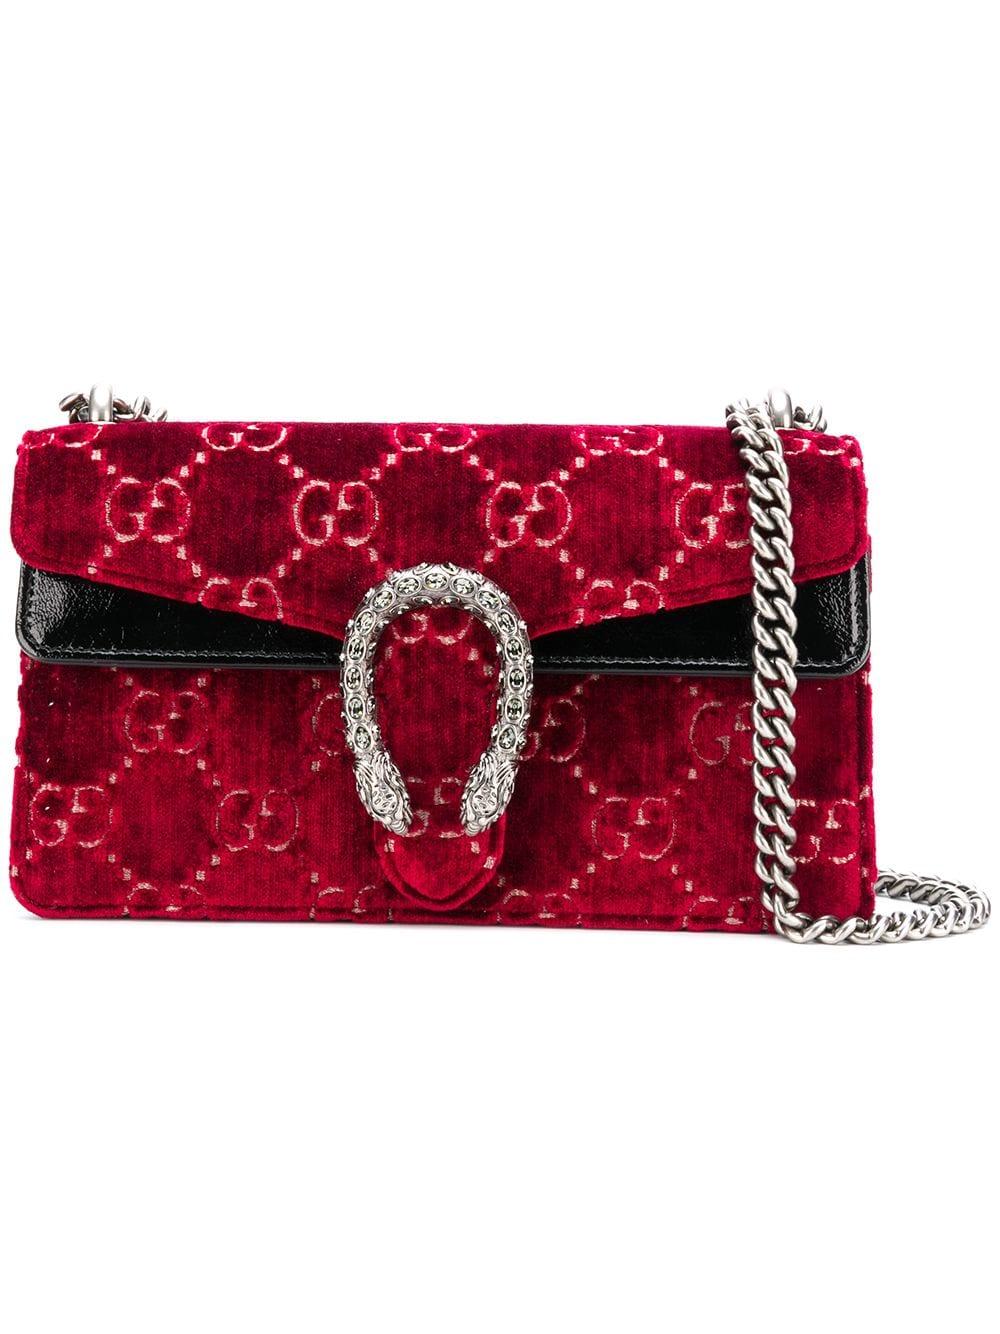 fa73f1b7e Gucci Dionysus GG Supreme bag - Red in 2019 | Products | Supreme bag ...